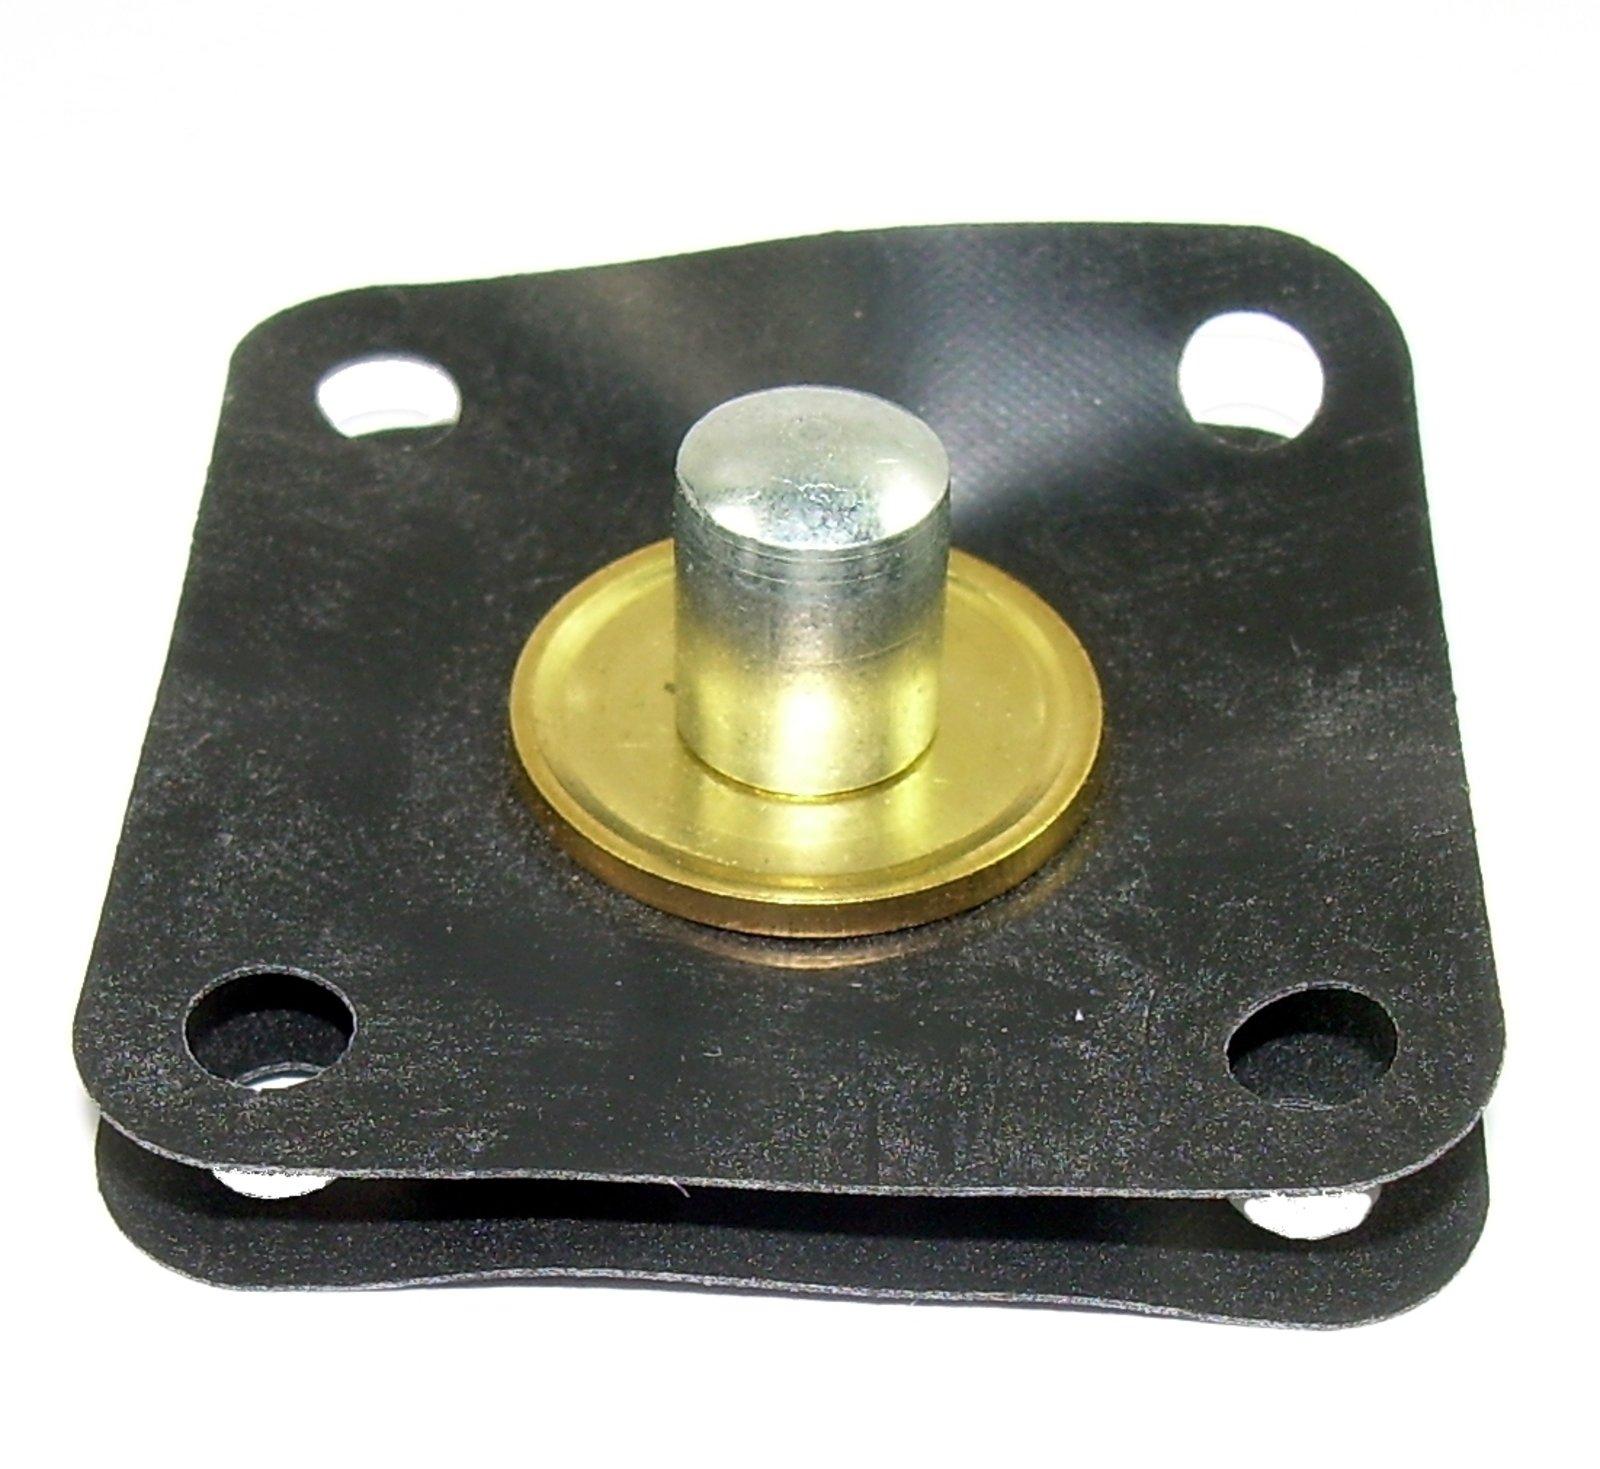 Yamaha Accelerator Pump Diaphragm Assembly For SR500 XT500 OEM 2H0-14940-00-00  29-216